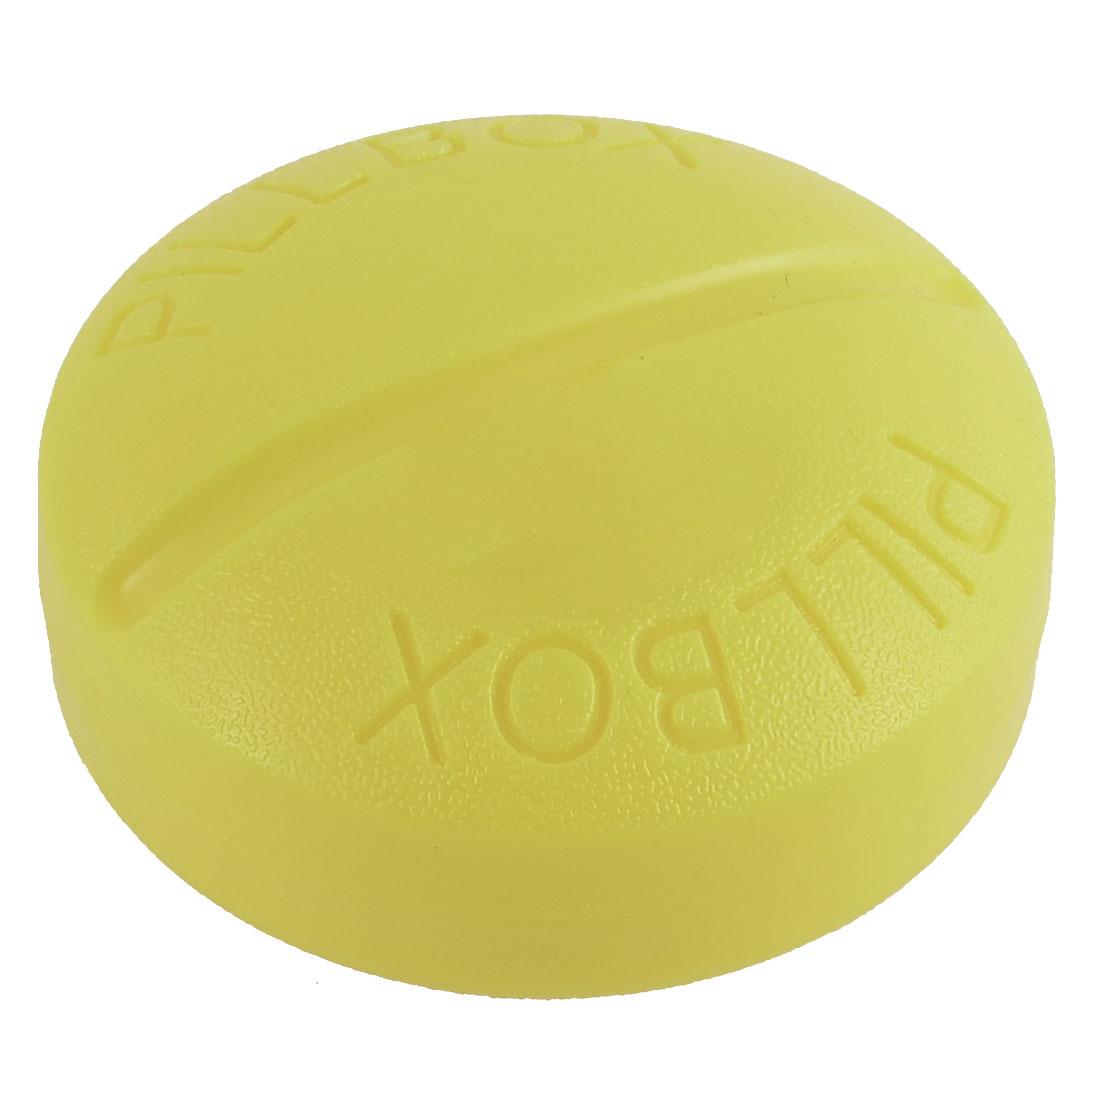 Plastic 4 Slots Tablet Pill Medicine Organizer Storage Case Box Yellow